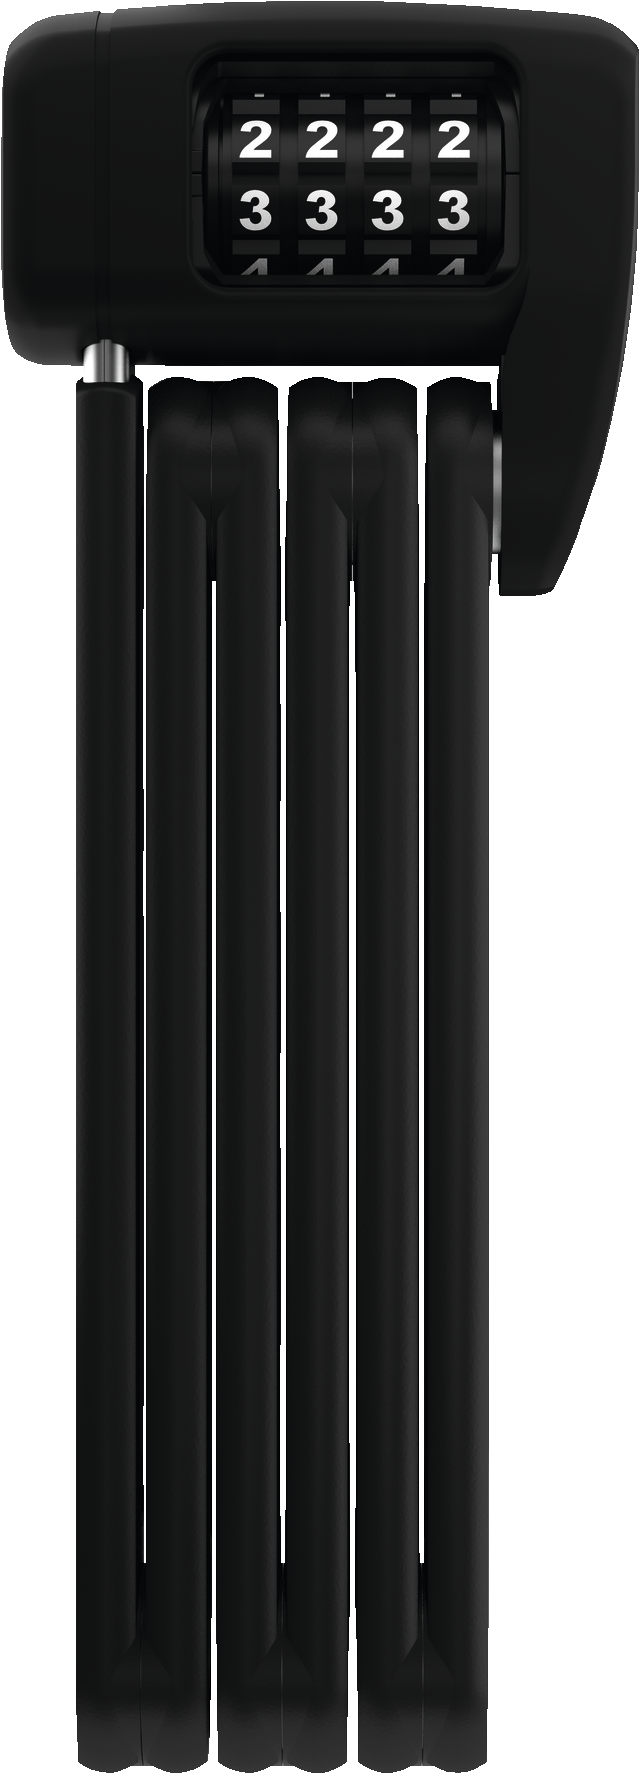 6055C/85 black SH BORDO Lite